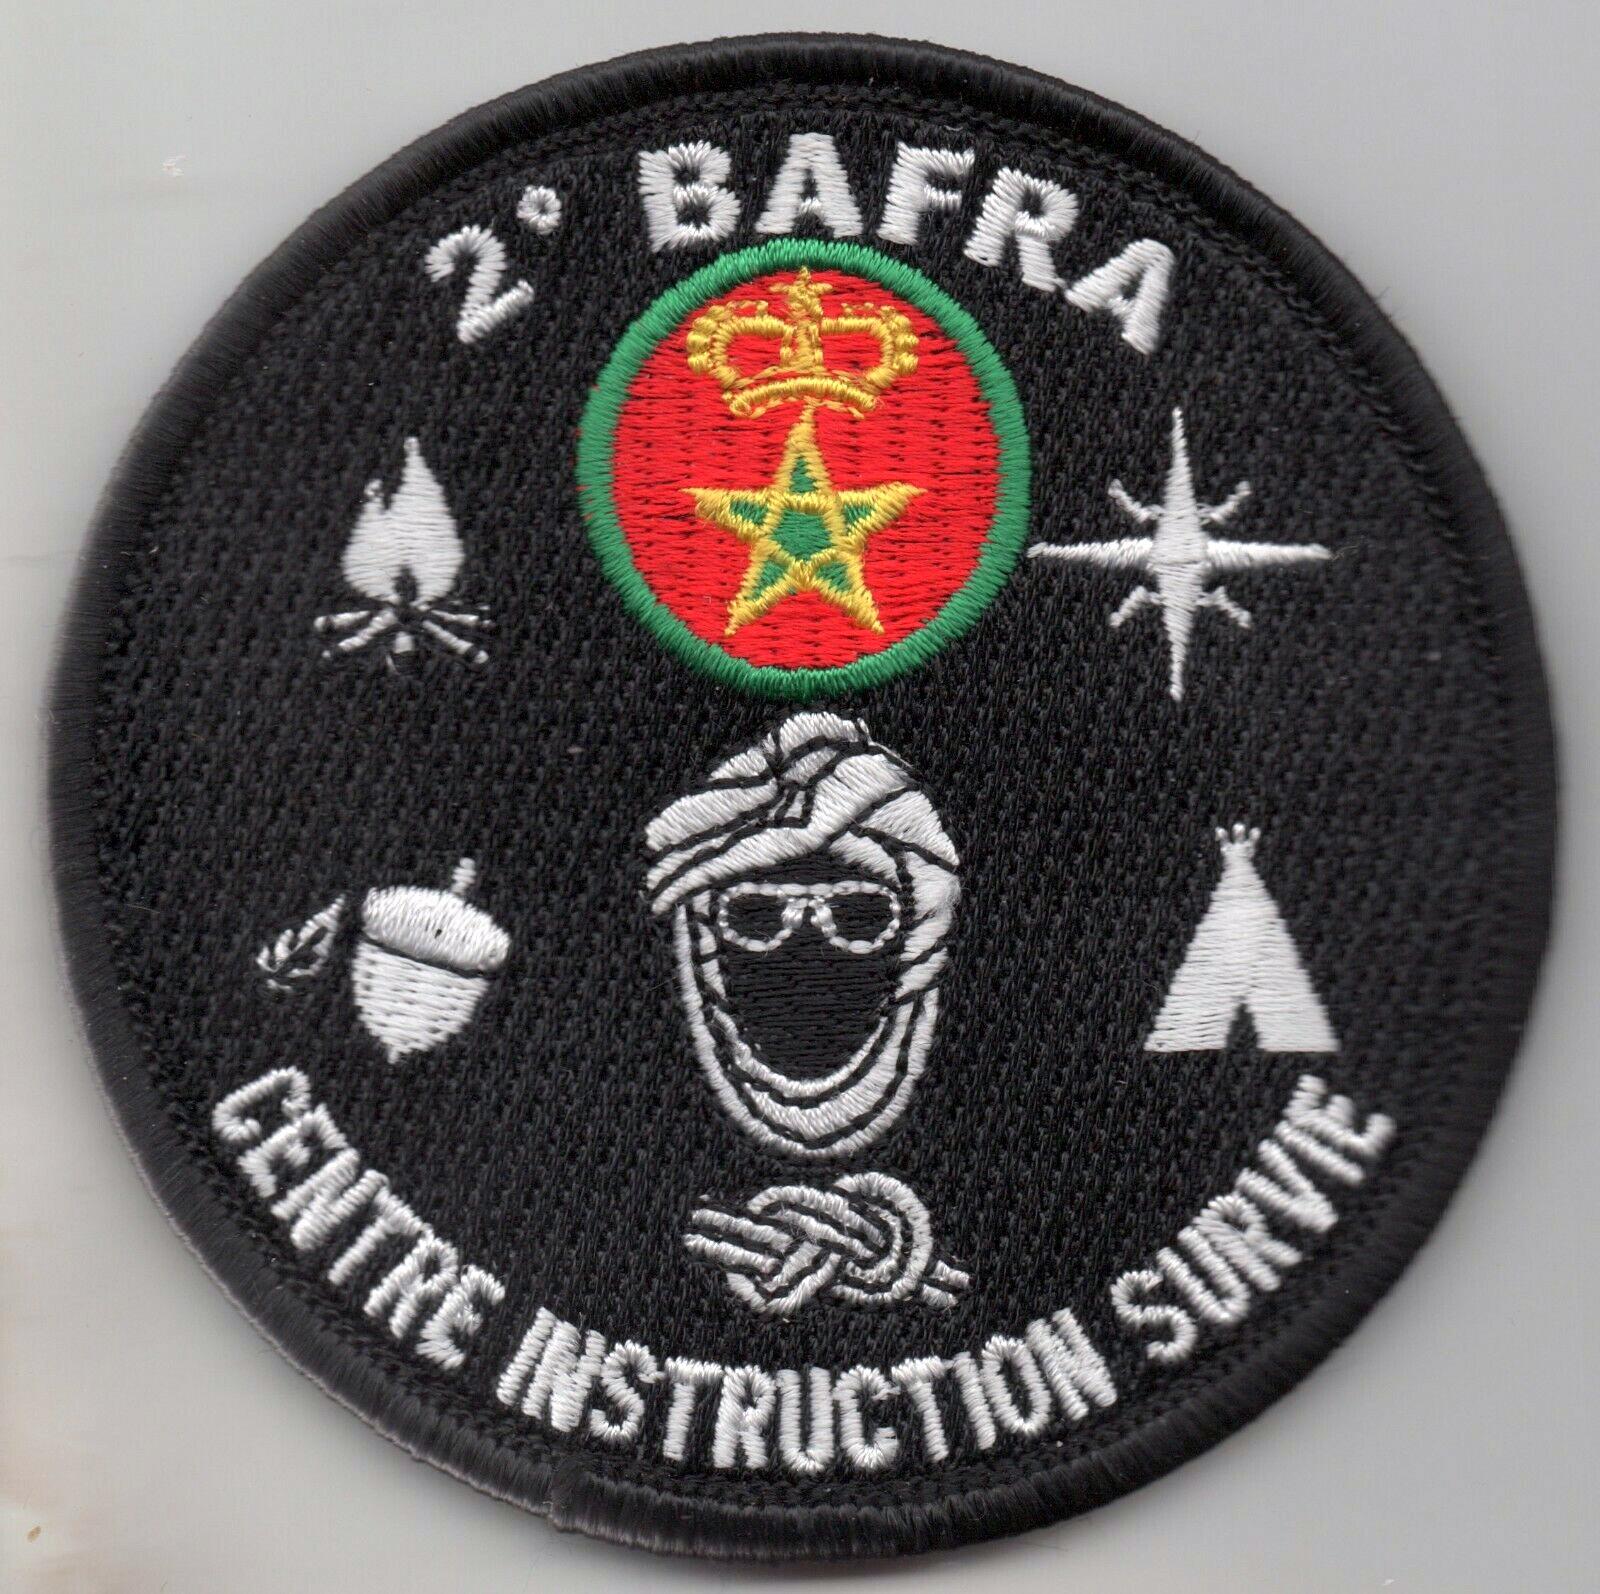 RMAF insignia Swirls Patches / Ecussons,cocardes et Insignes Des FRA - Page 8 49509280167_b43eb938c8_h